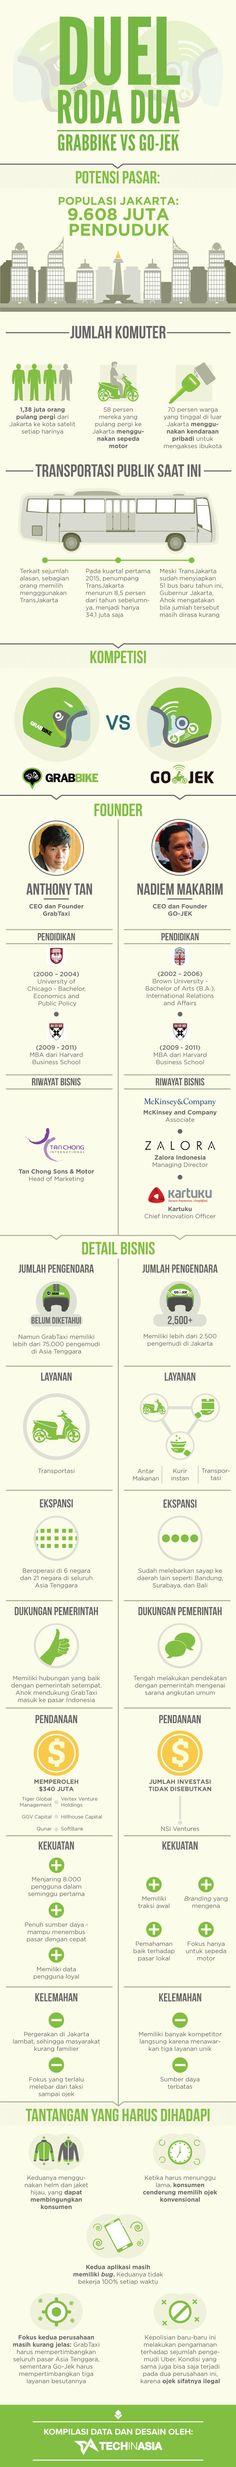 Gojek-vs-GrabBike-Comparison-(Indonesian)